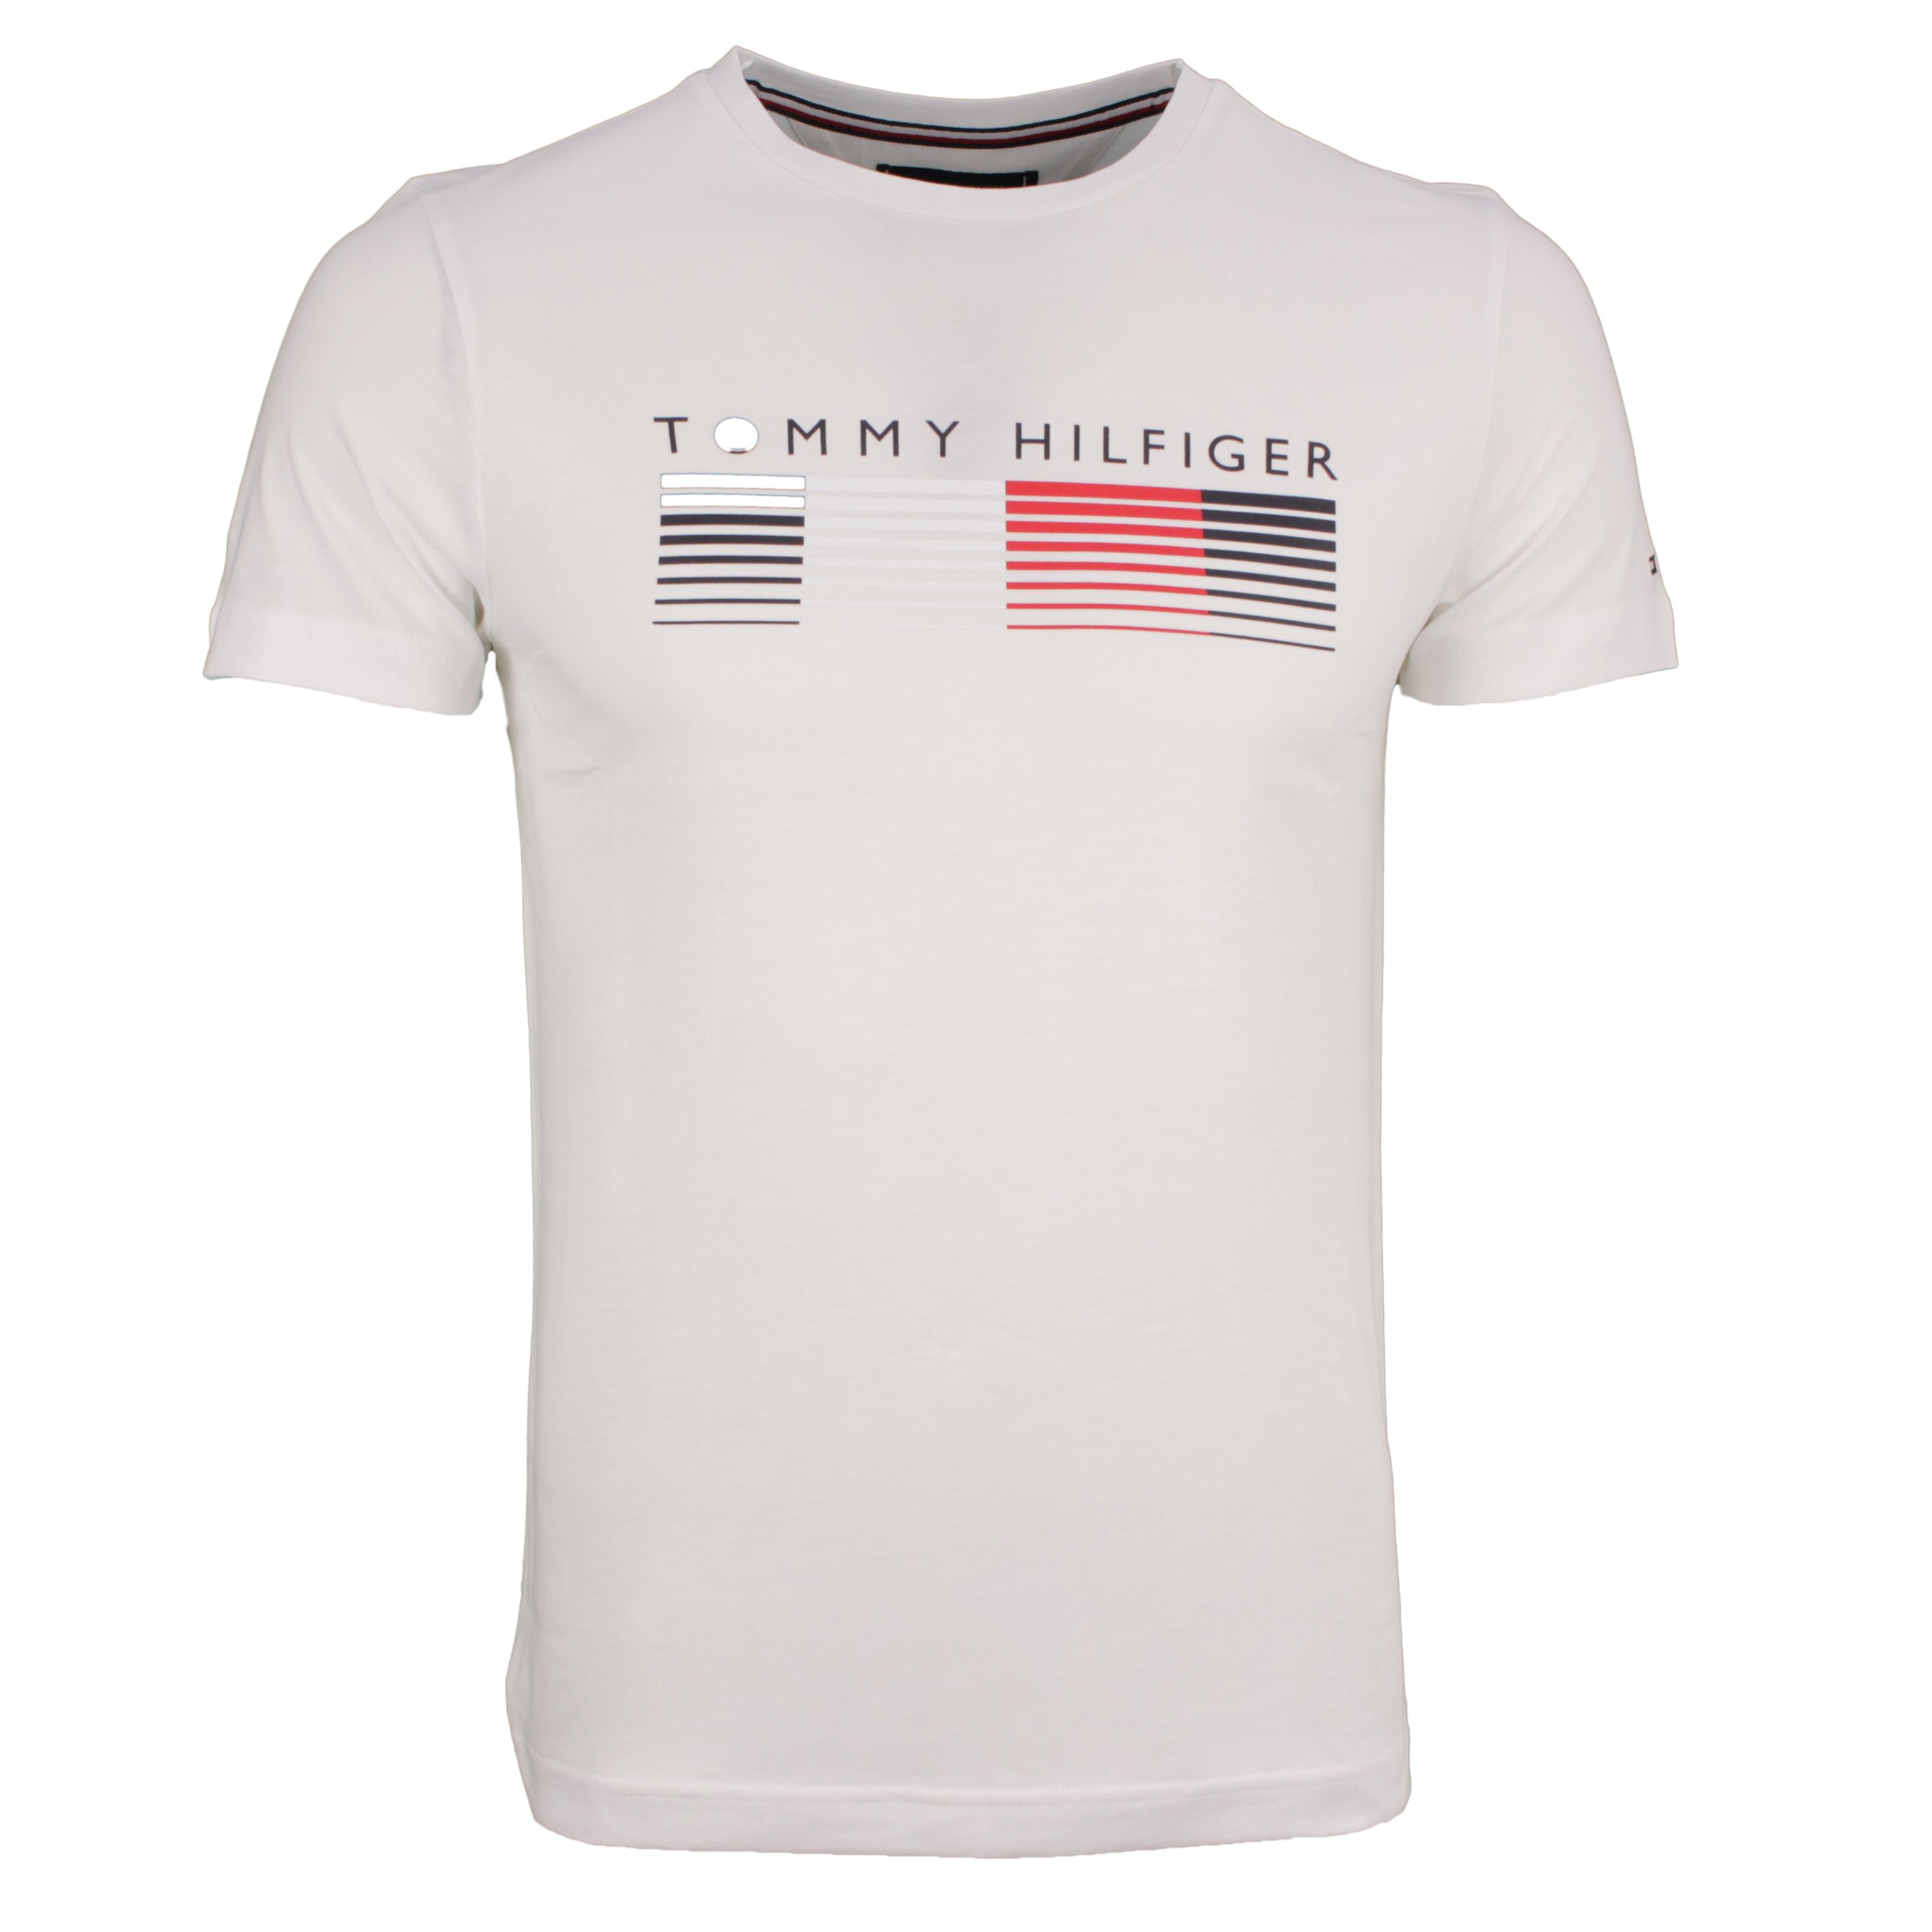 Tommy Hilfiger T-Shirt Shirt kurzarm Fade Graphic Corp Tee weiß MW0MW21008 YBR-white